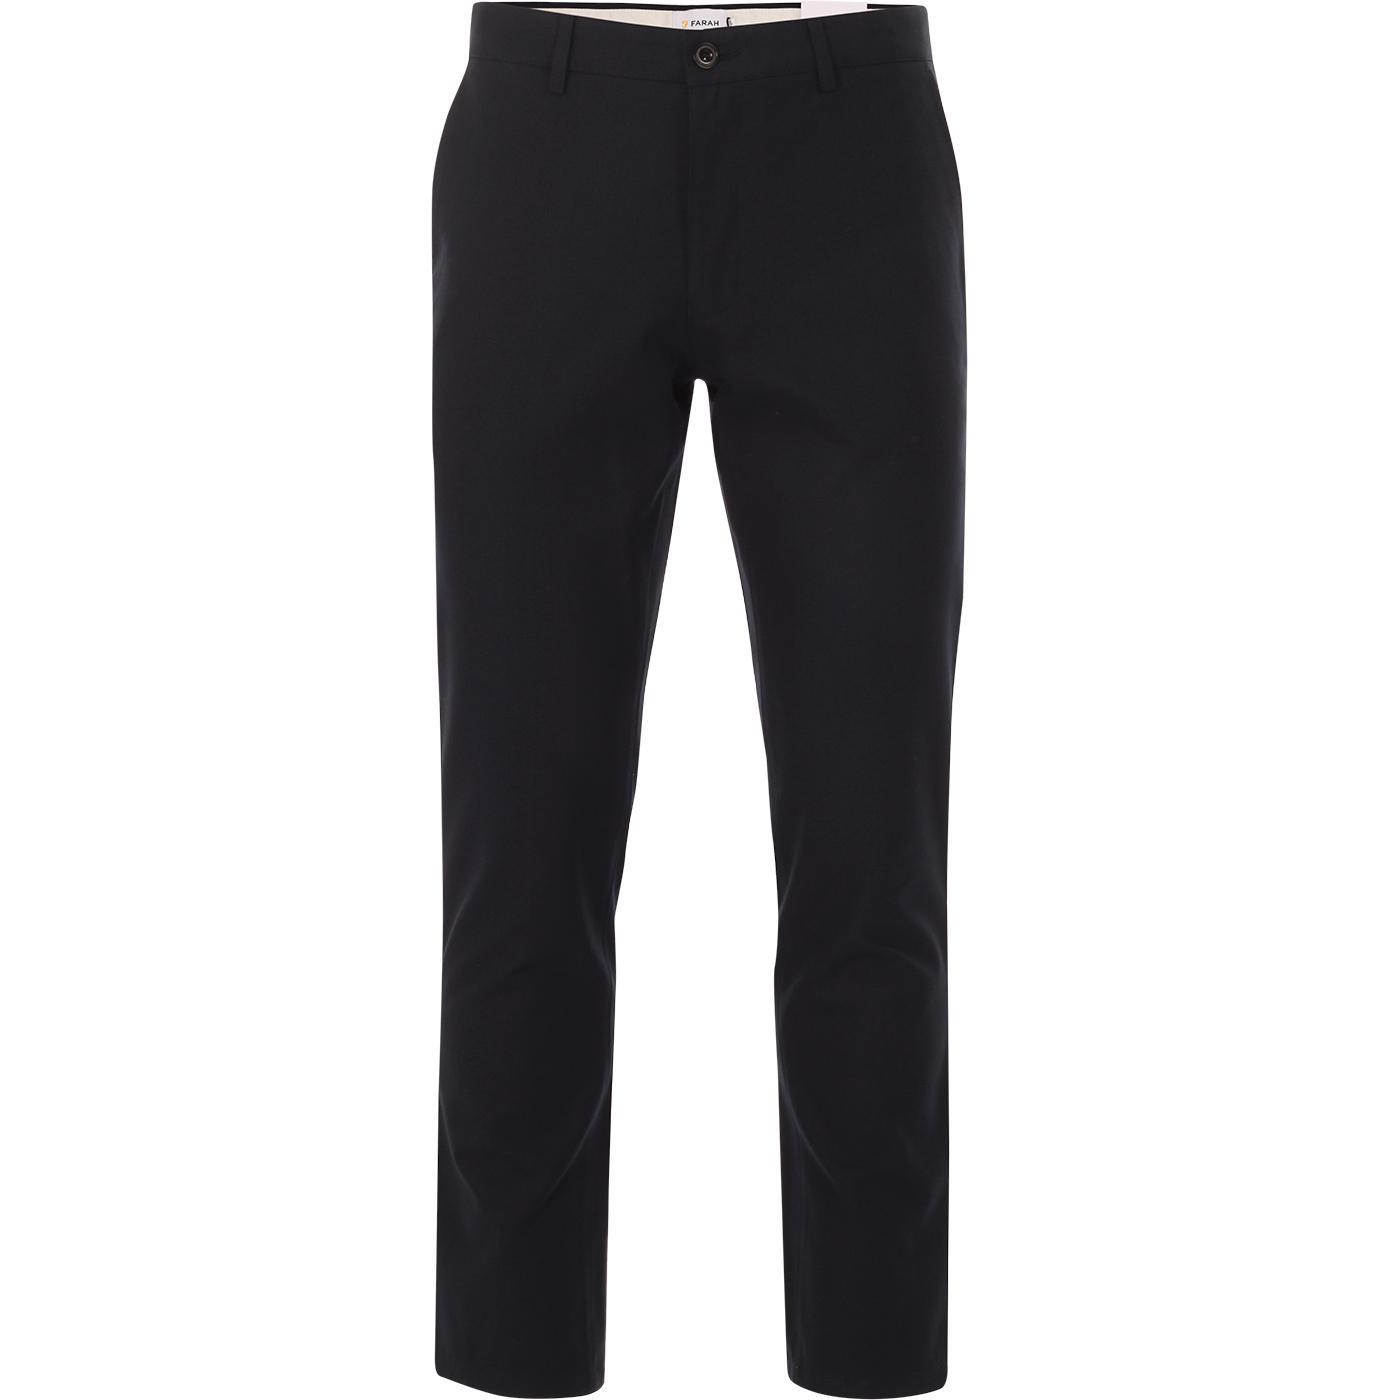 Elm FARAH Retro Mod Slim Hopsack Trousers (TN)